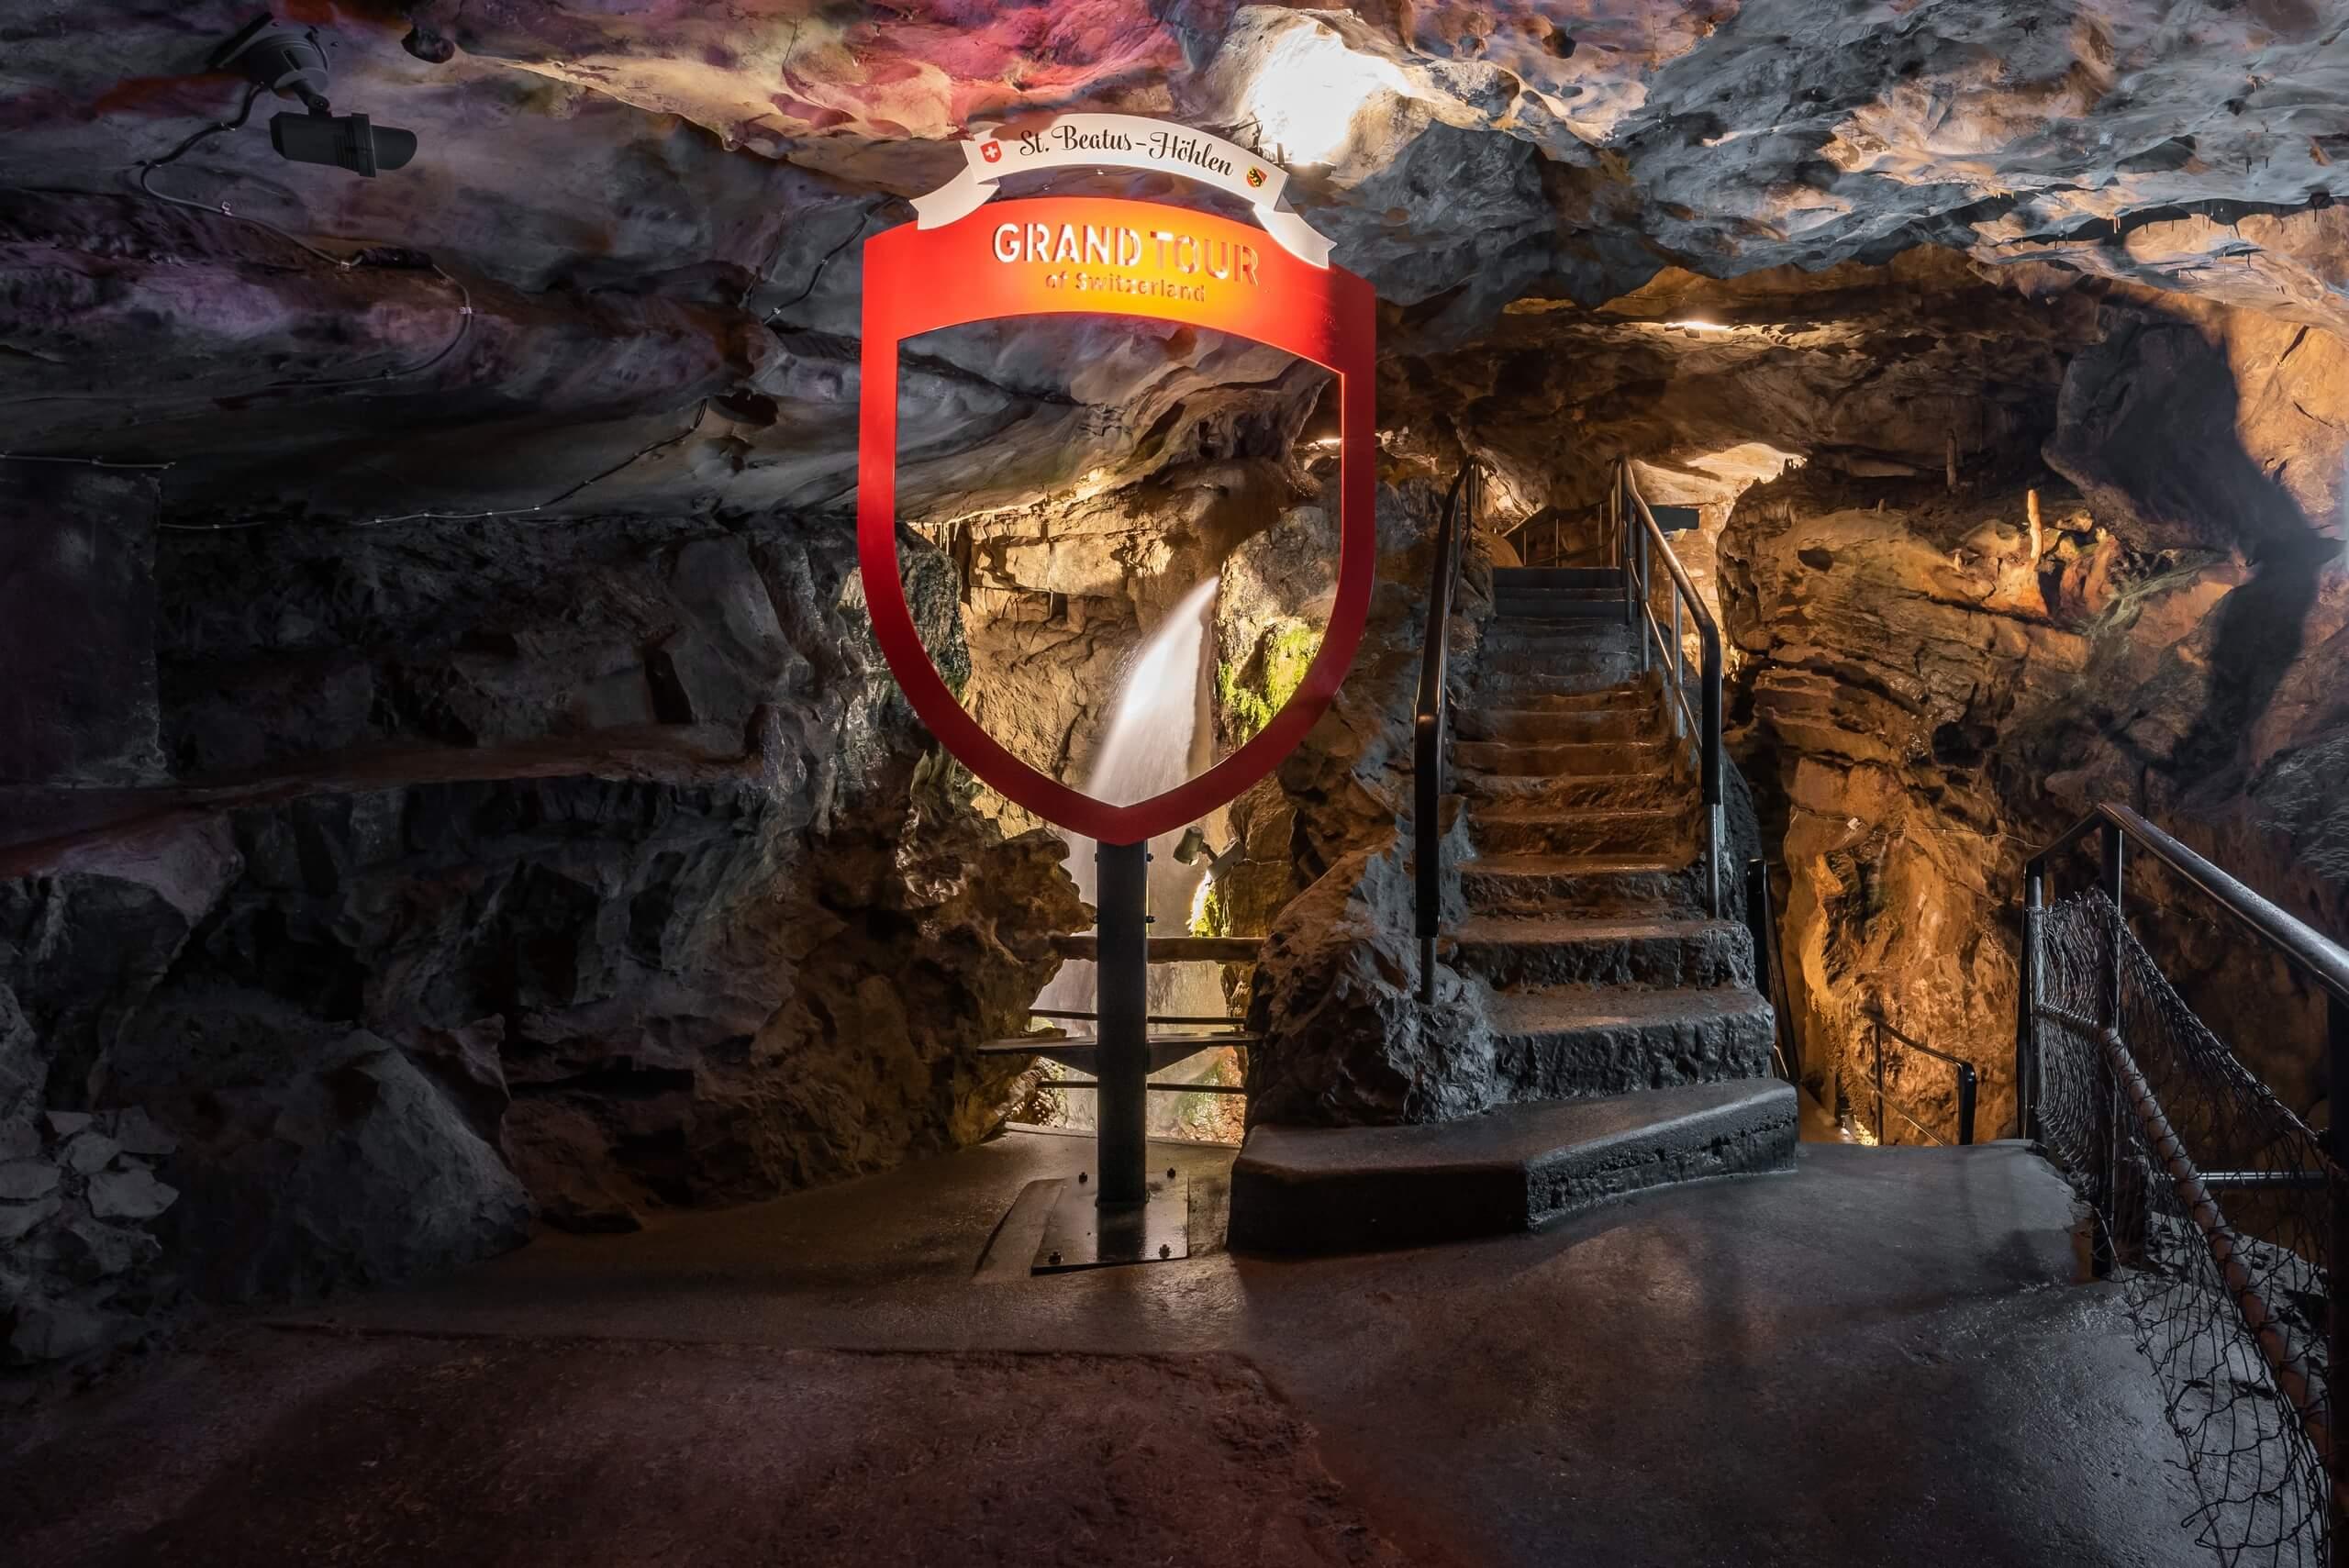 st-beatus-hoehlen-grand-tour-of-switzerland-sommer-beleuchtung